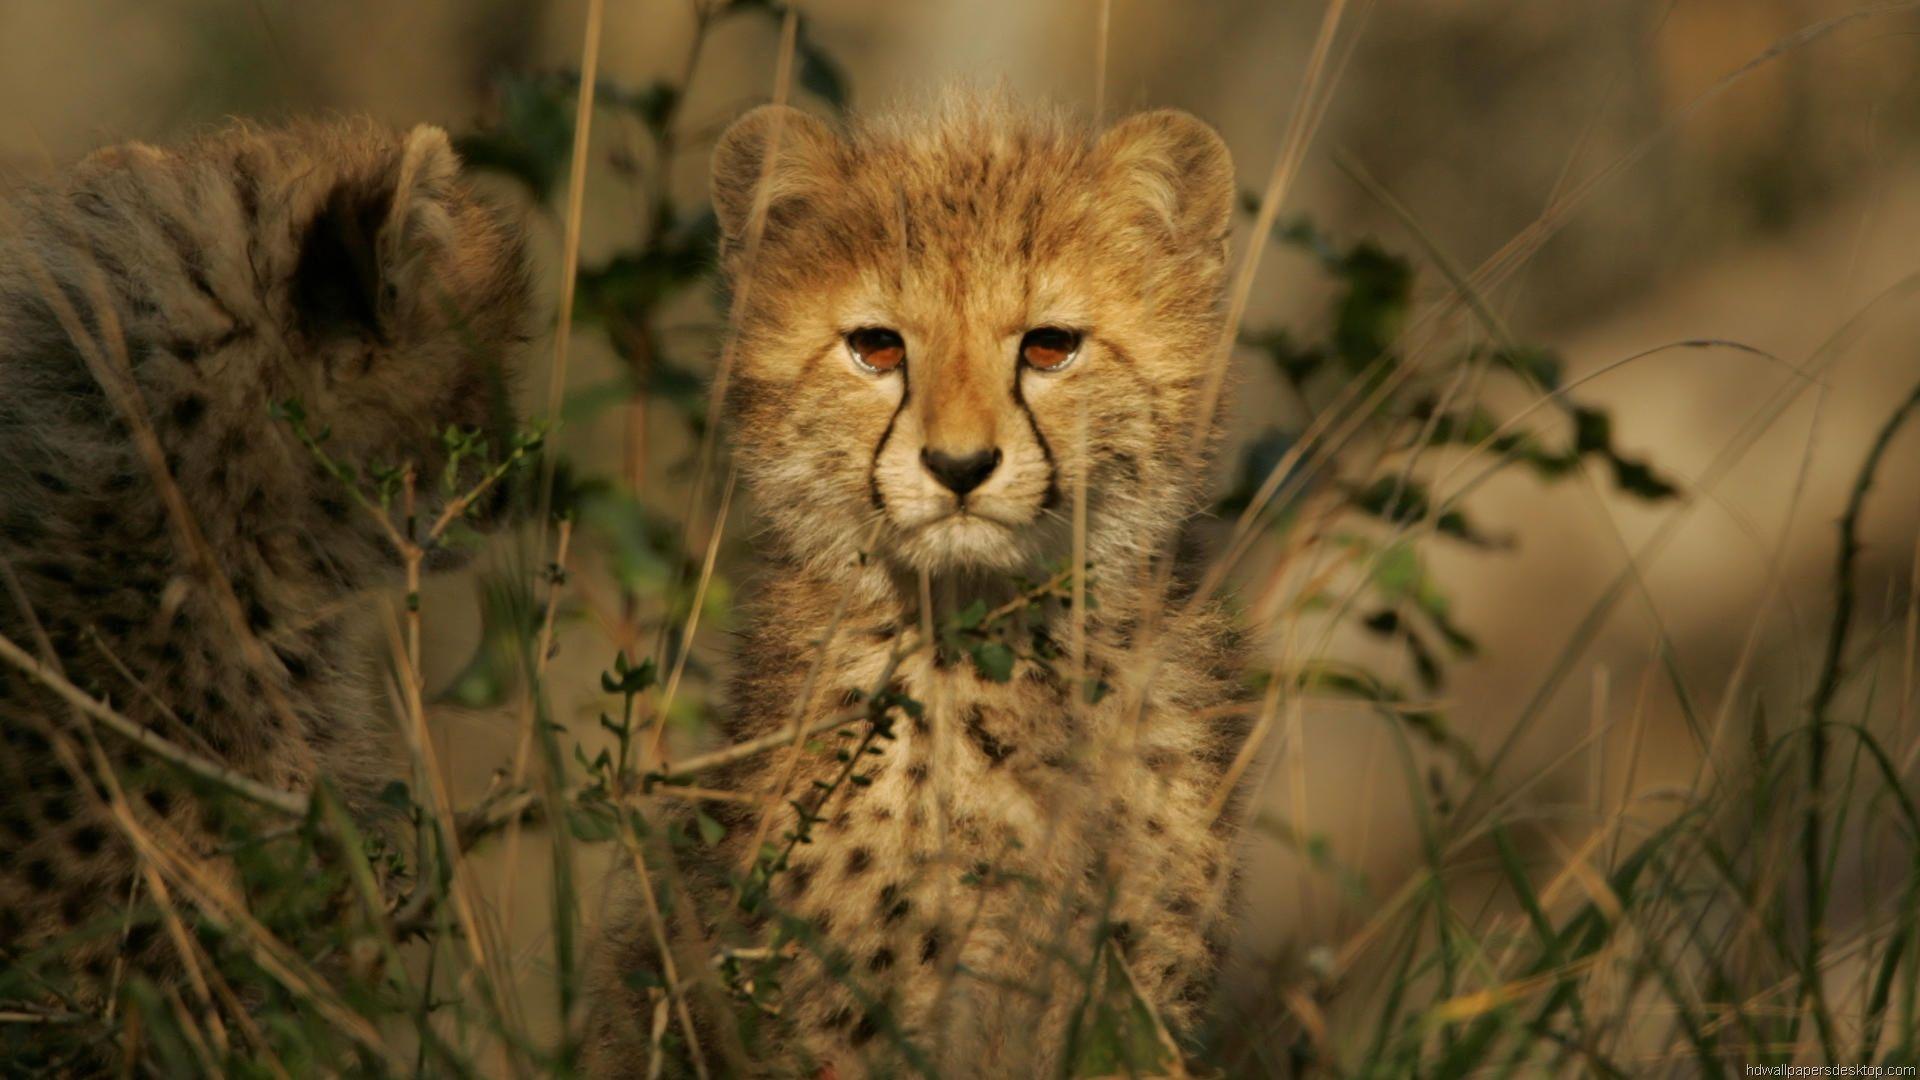 Full Hd P Cat Wallpapers Hd Desktop Backgrounds X Cheetah Wallpaper Tiger Wallpaper Cheetah Cubs